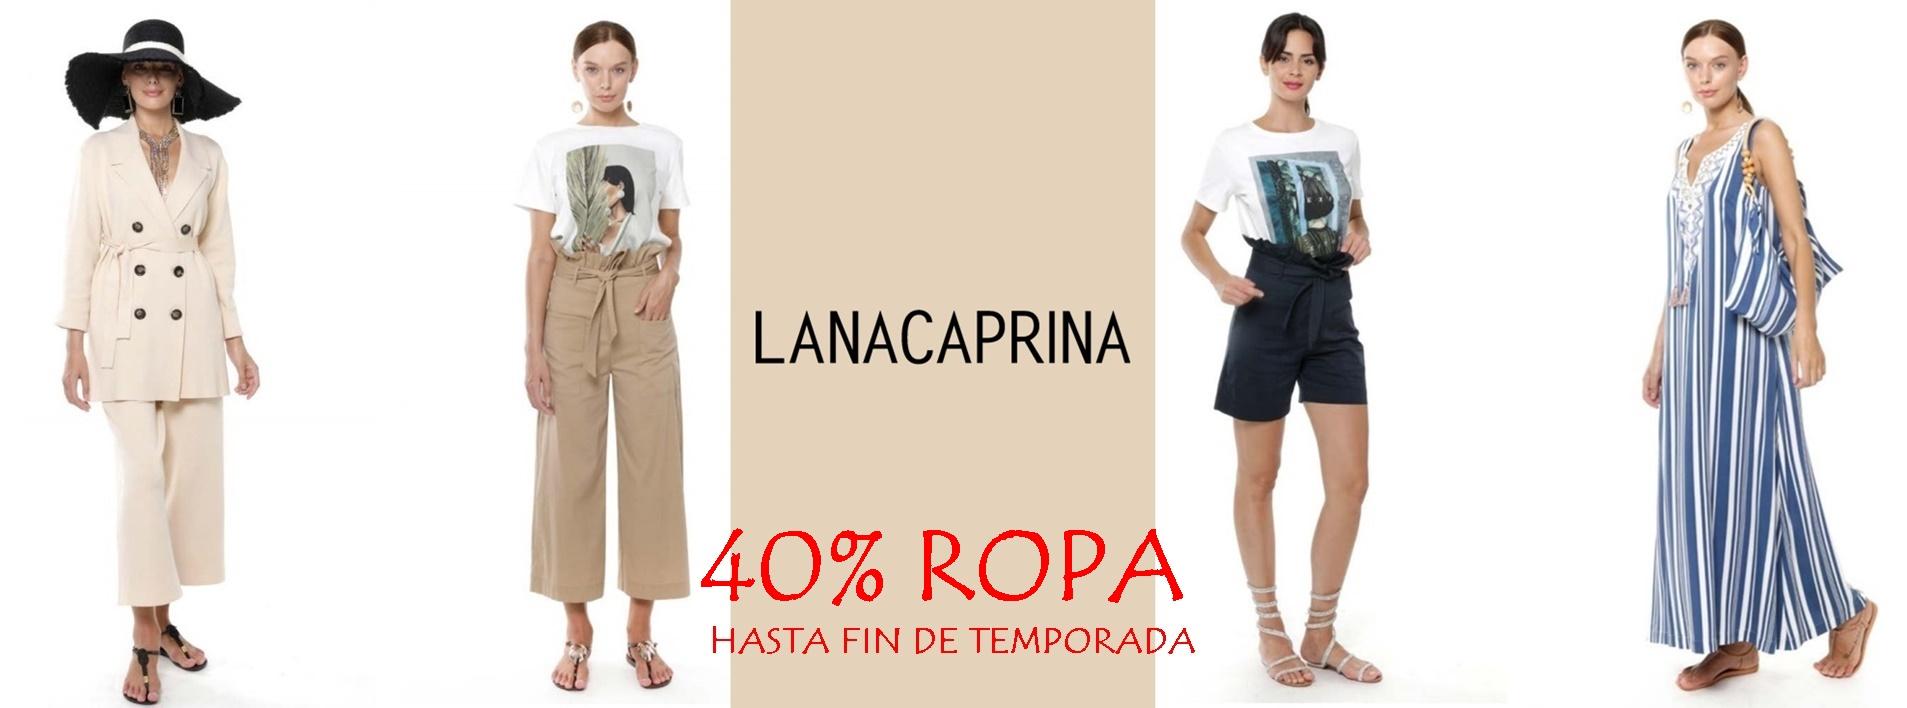 lanacaprina-banner-primavera-verano-rebajas